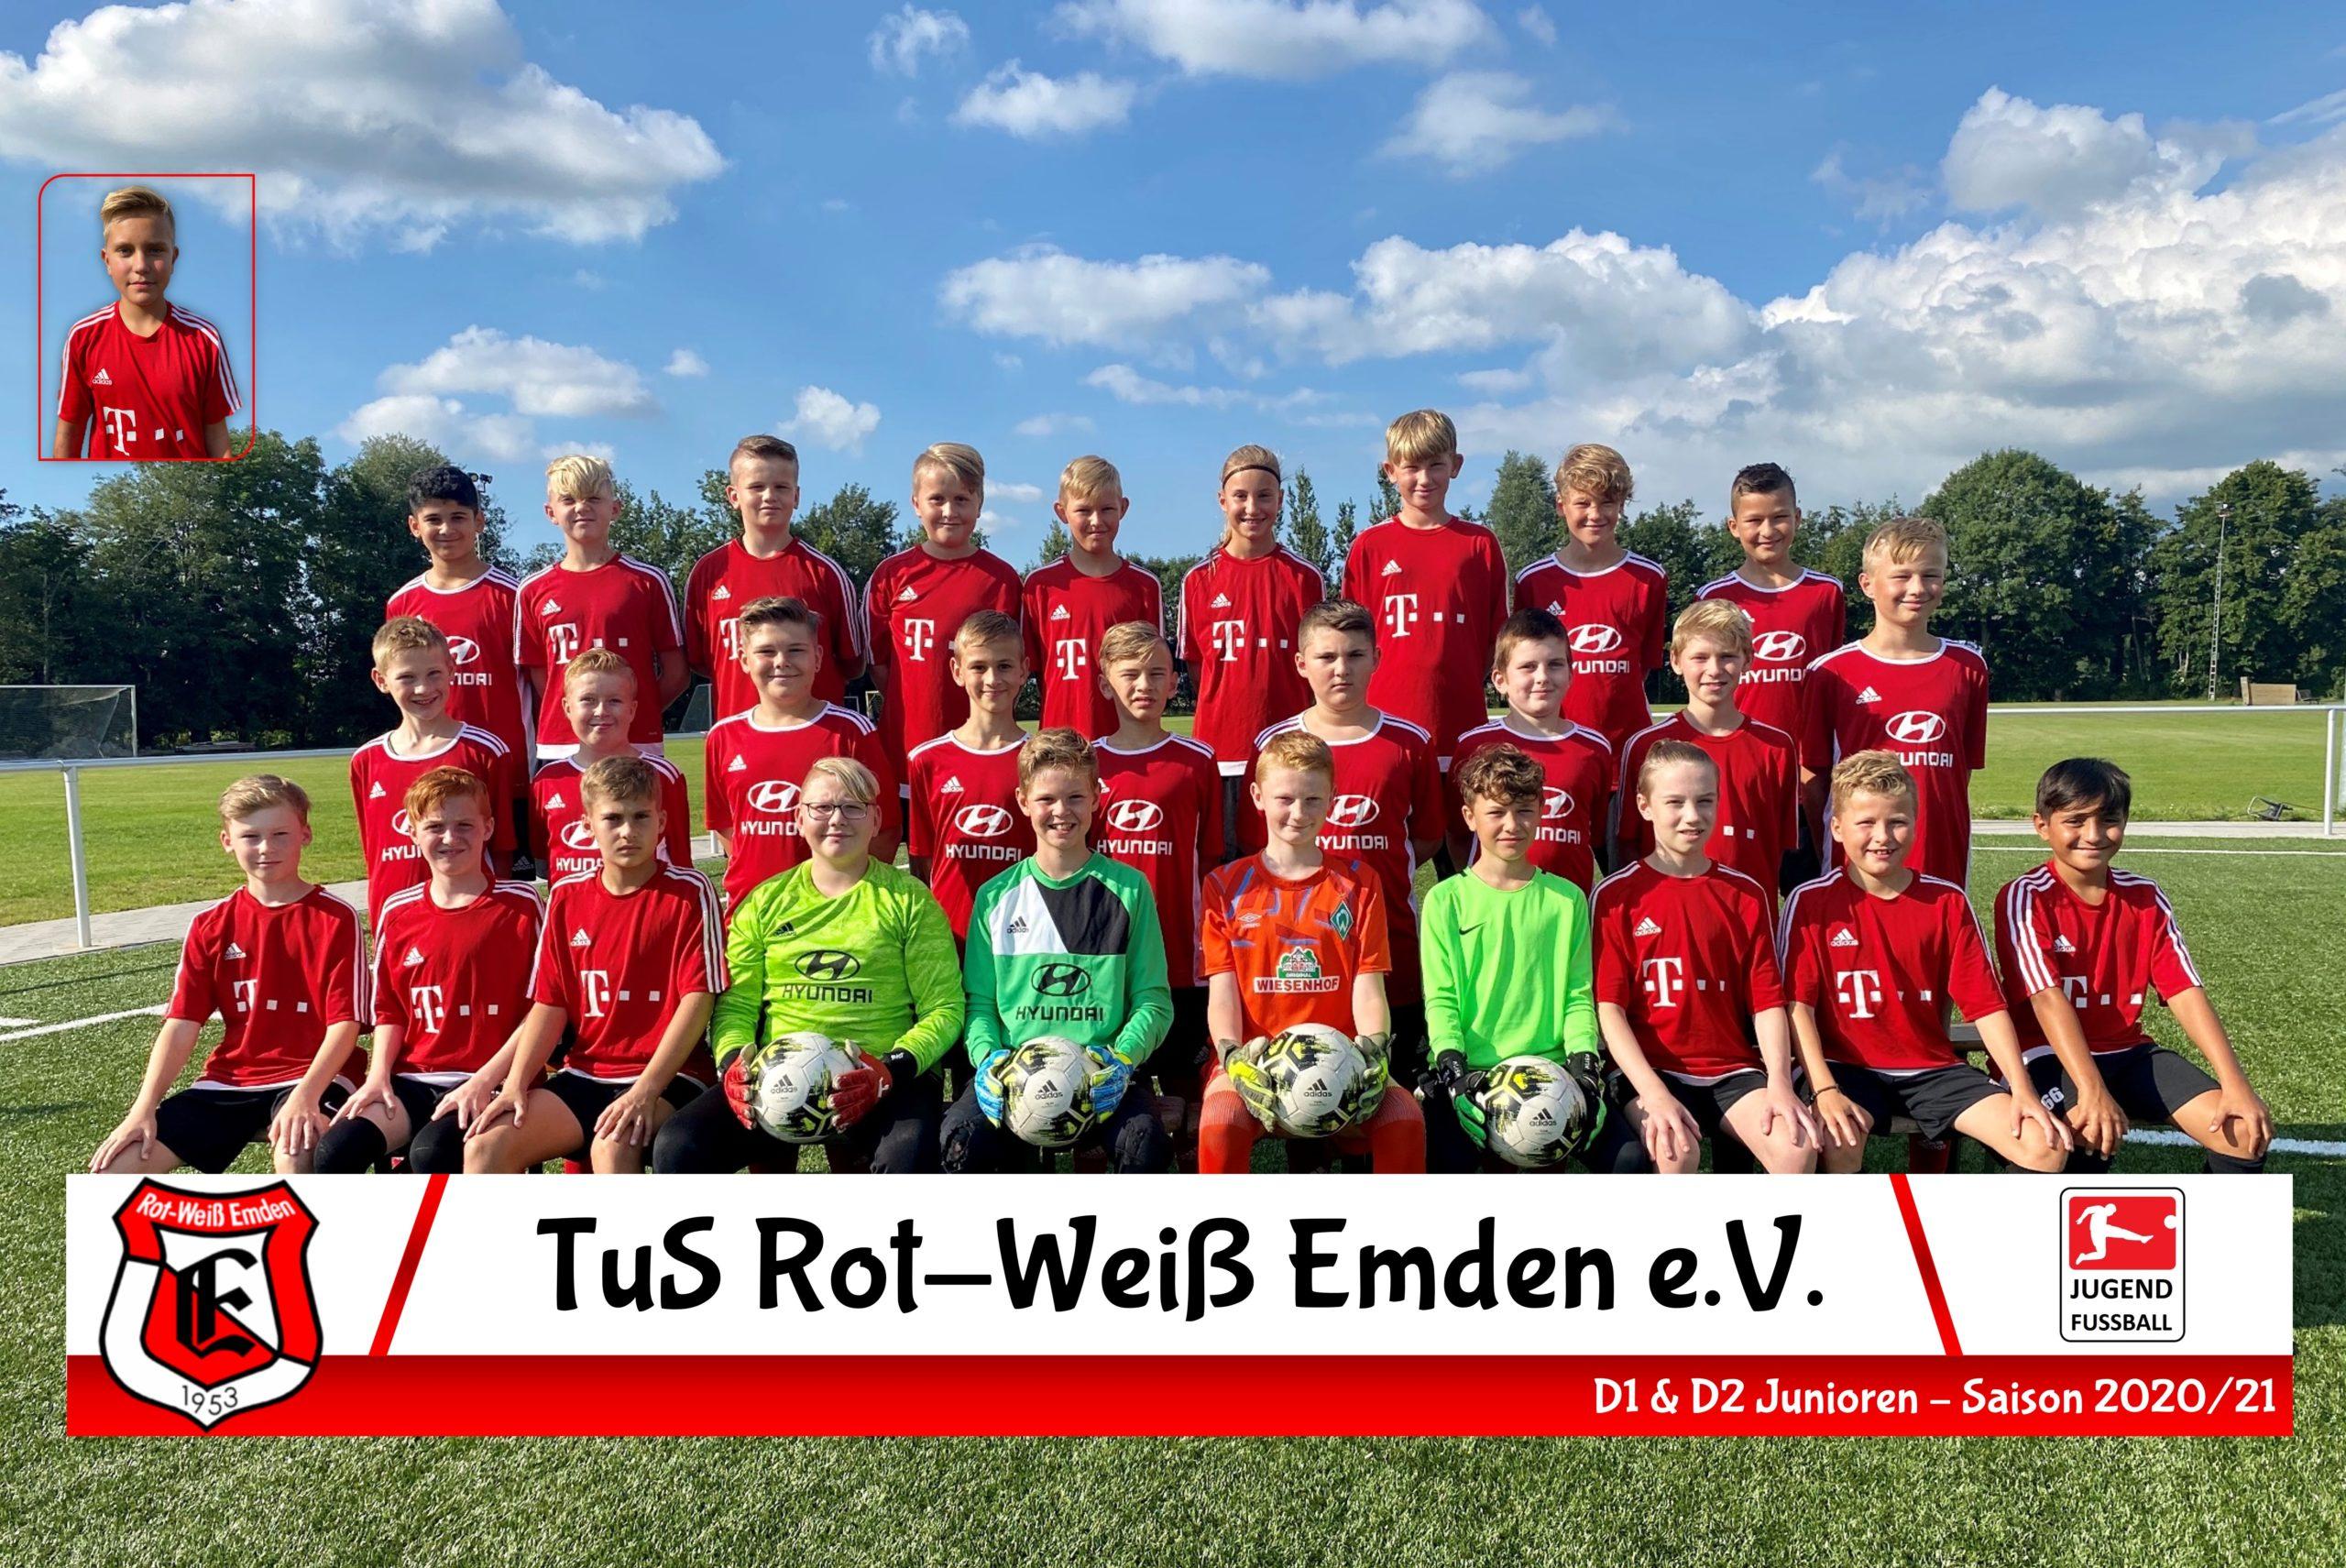 TuS Rot-Weiß Emden D1-Junioren Saison 20/21